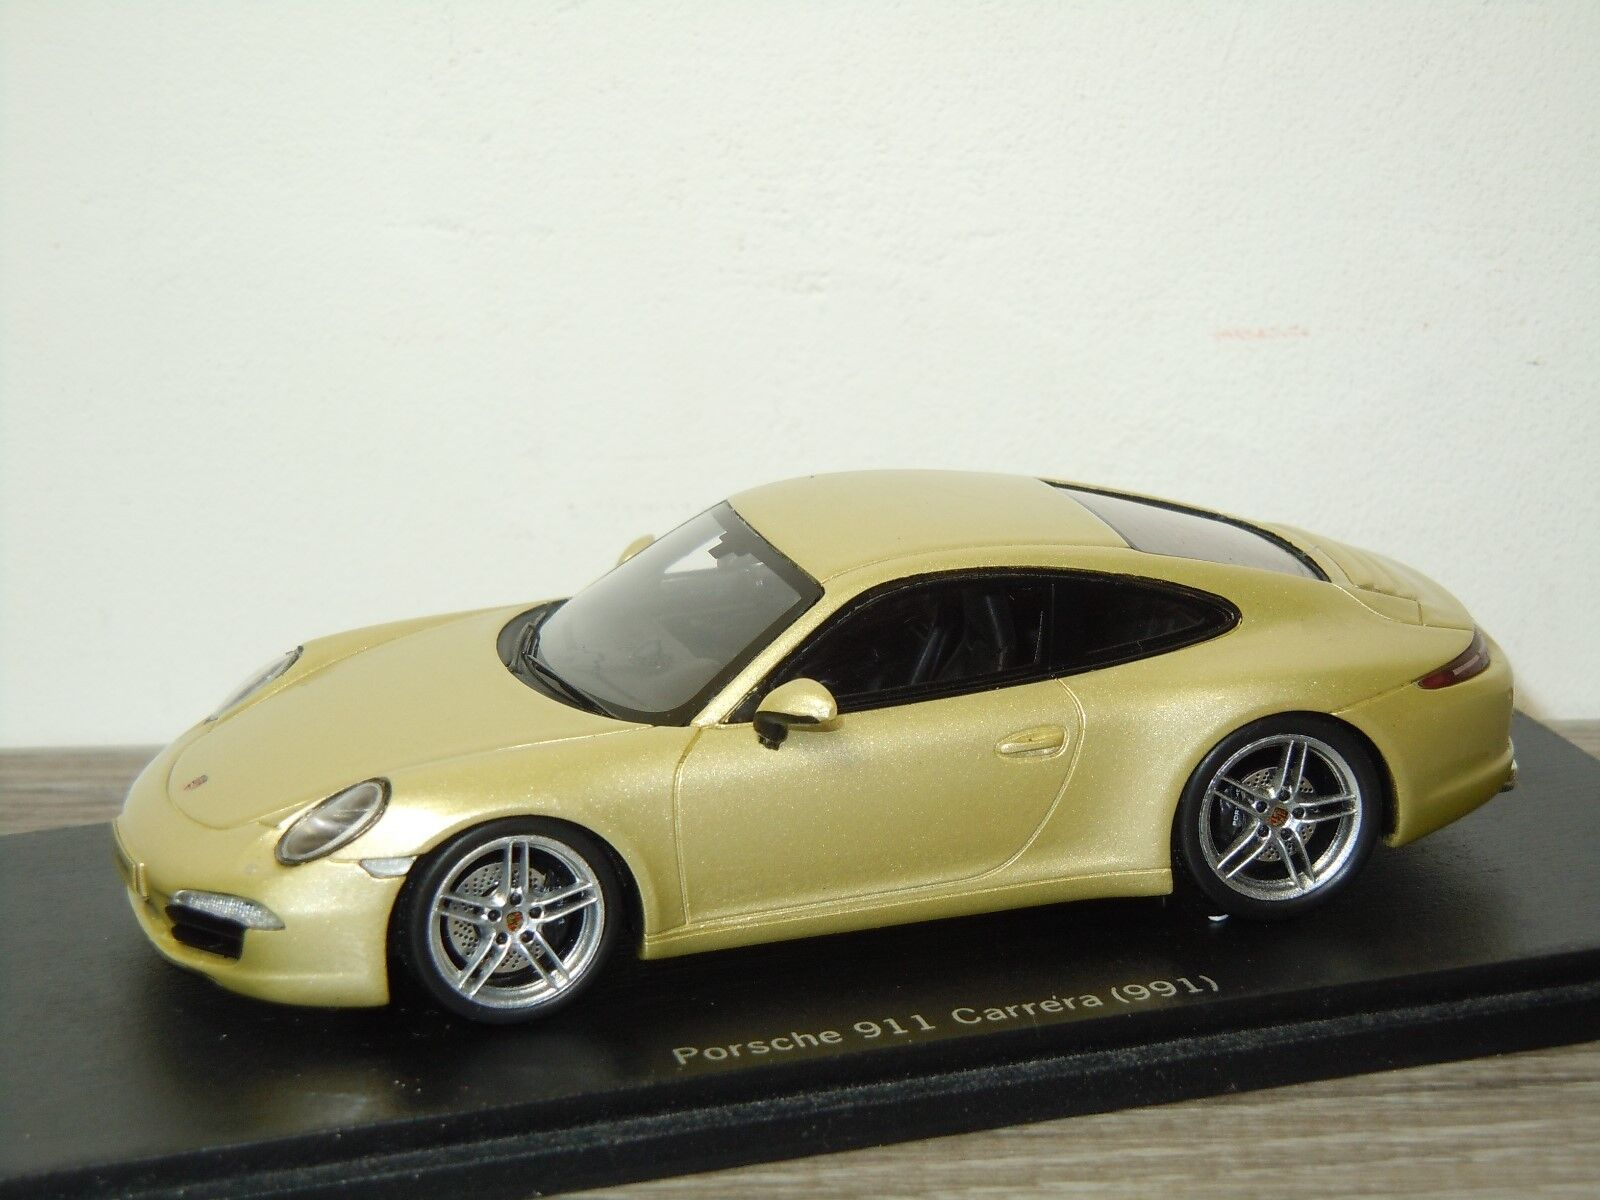 Porsche 911 991 Carrera Coupe - Spark Porsche Museum 1 43 in Box 30303